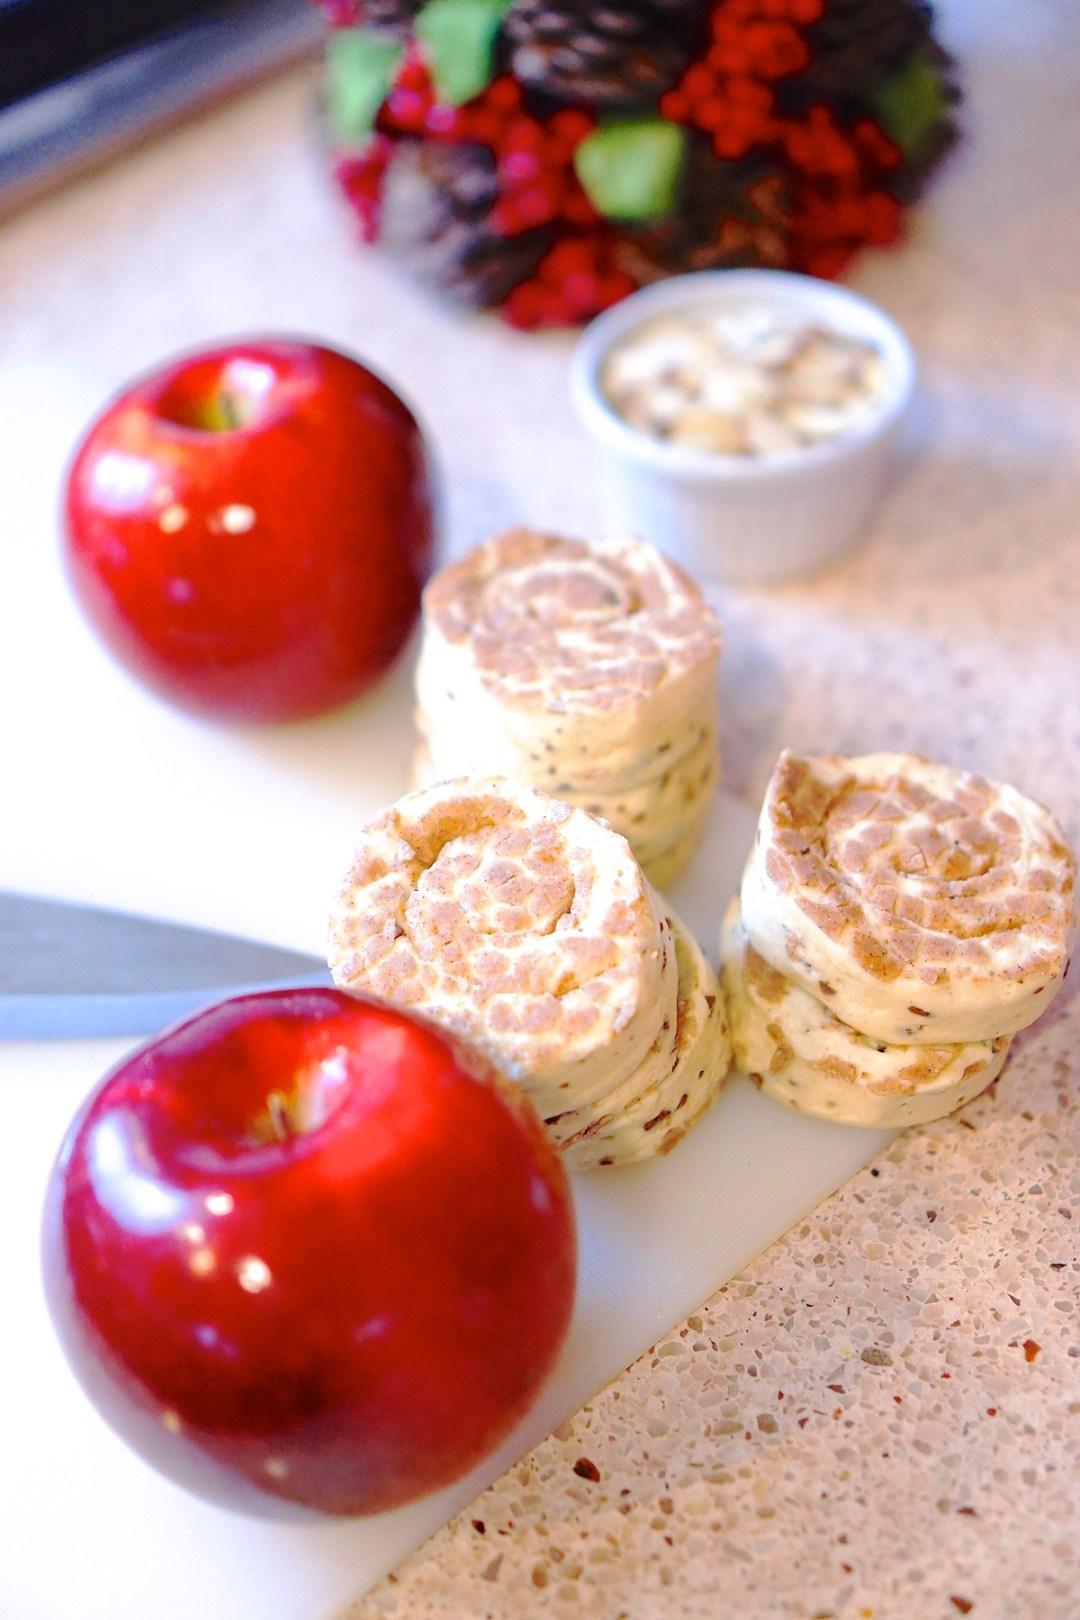 Cinnamon Roll & Almond Stuffed Baked Apples - The February Fox